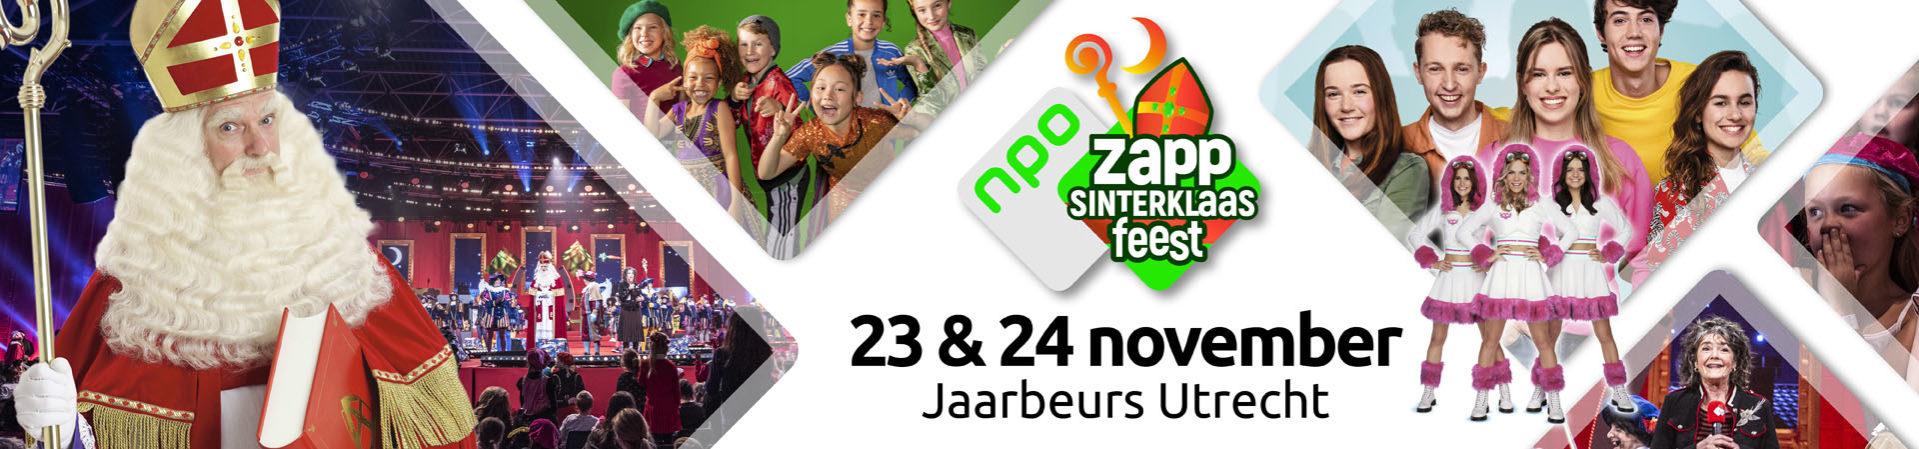 Ticketverkoop ZAPP Sinterklaas 2019